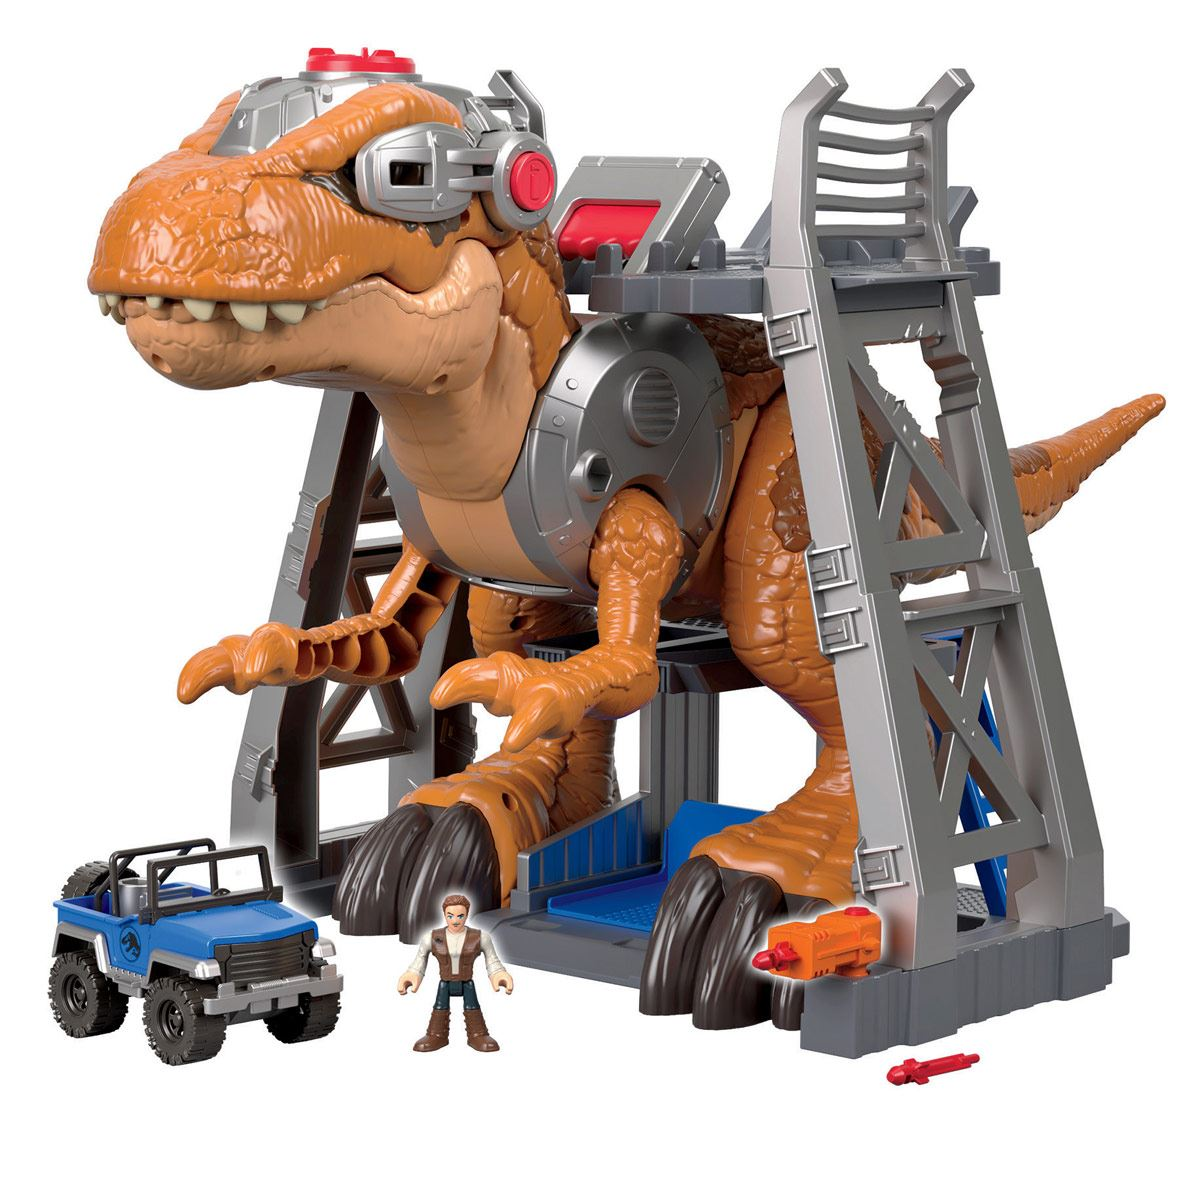 Fisher Price Imaginext Gran T.Rex